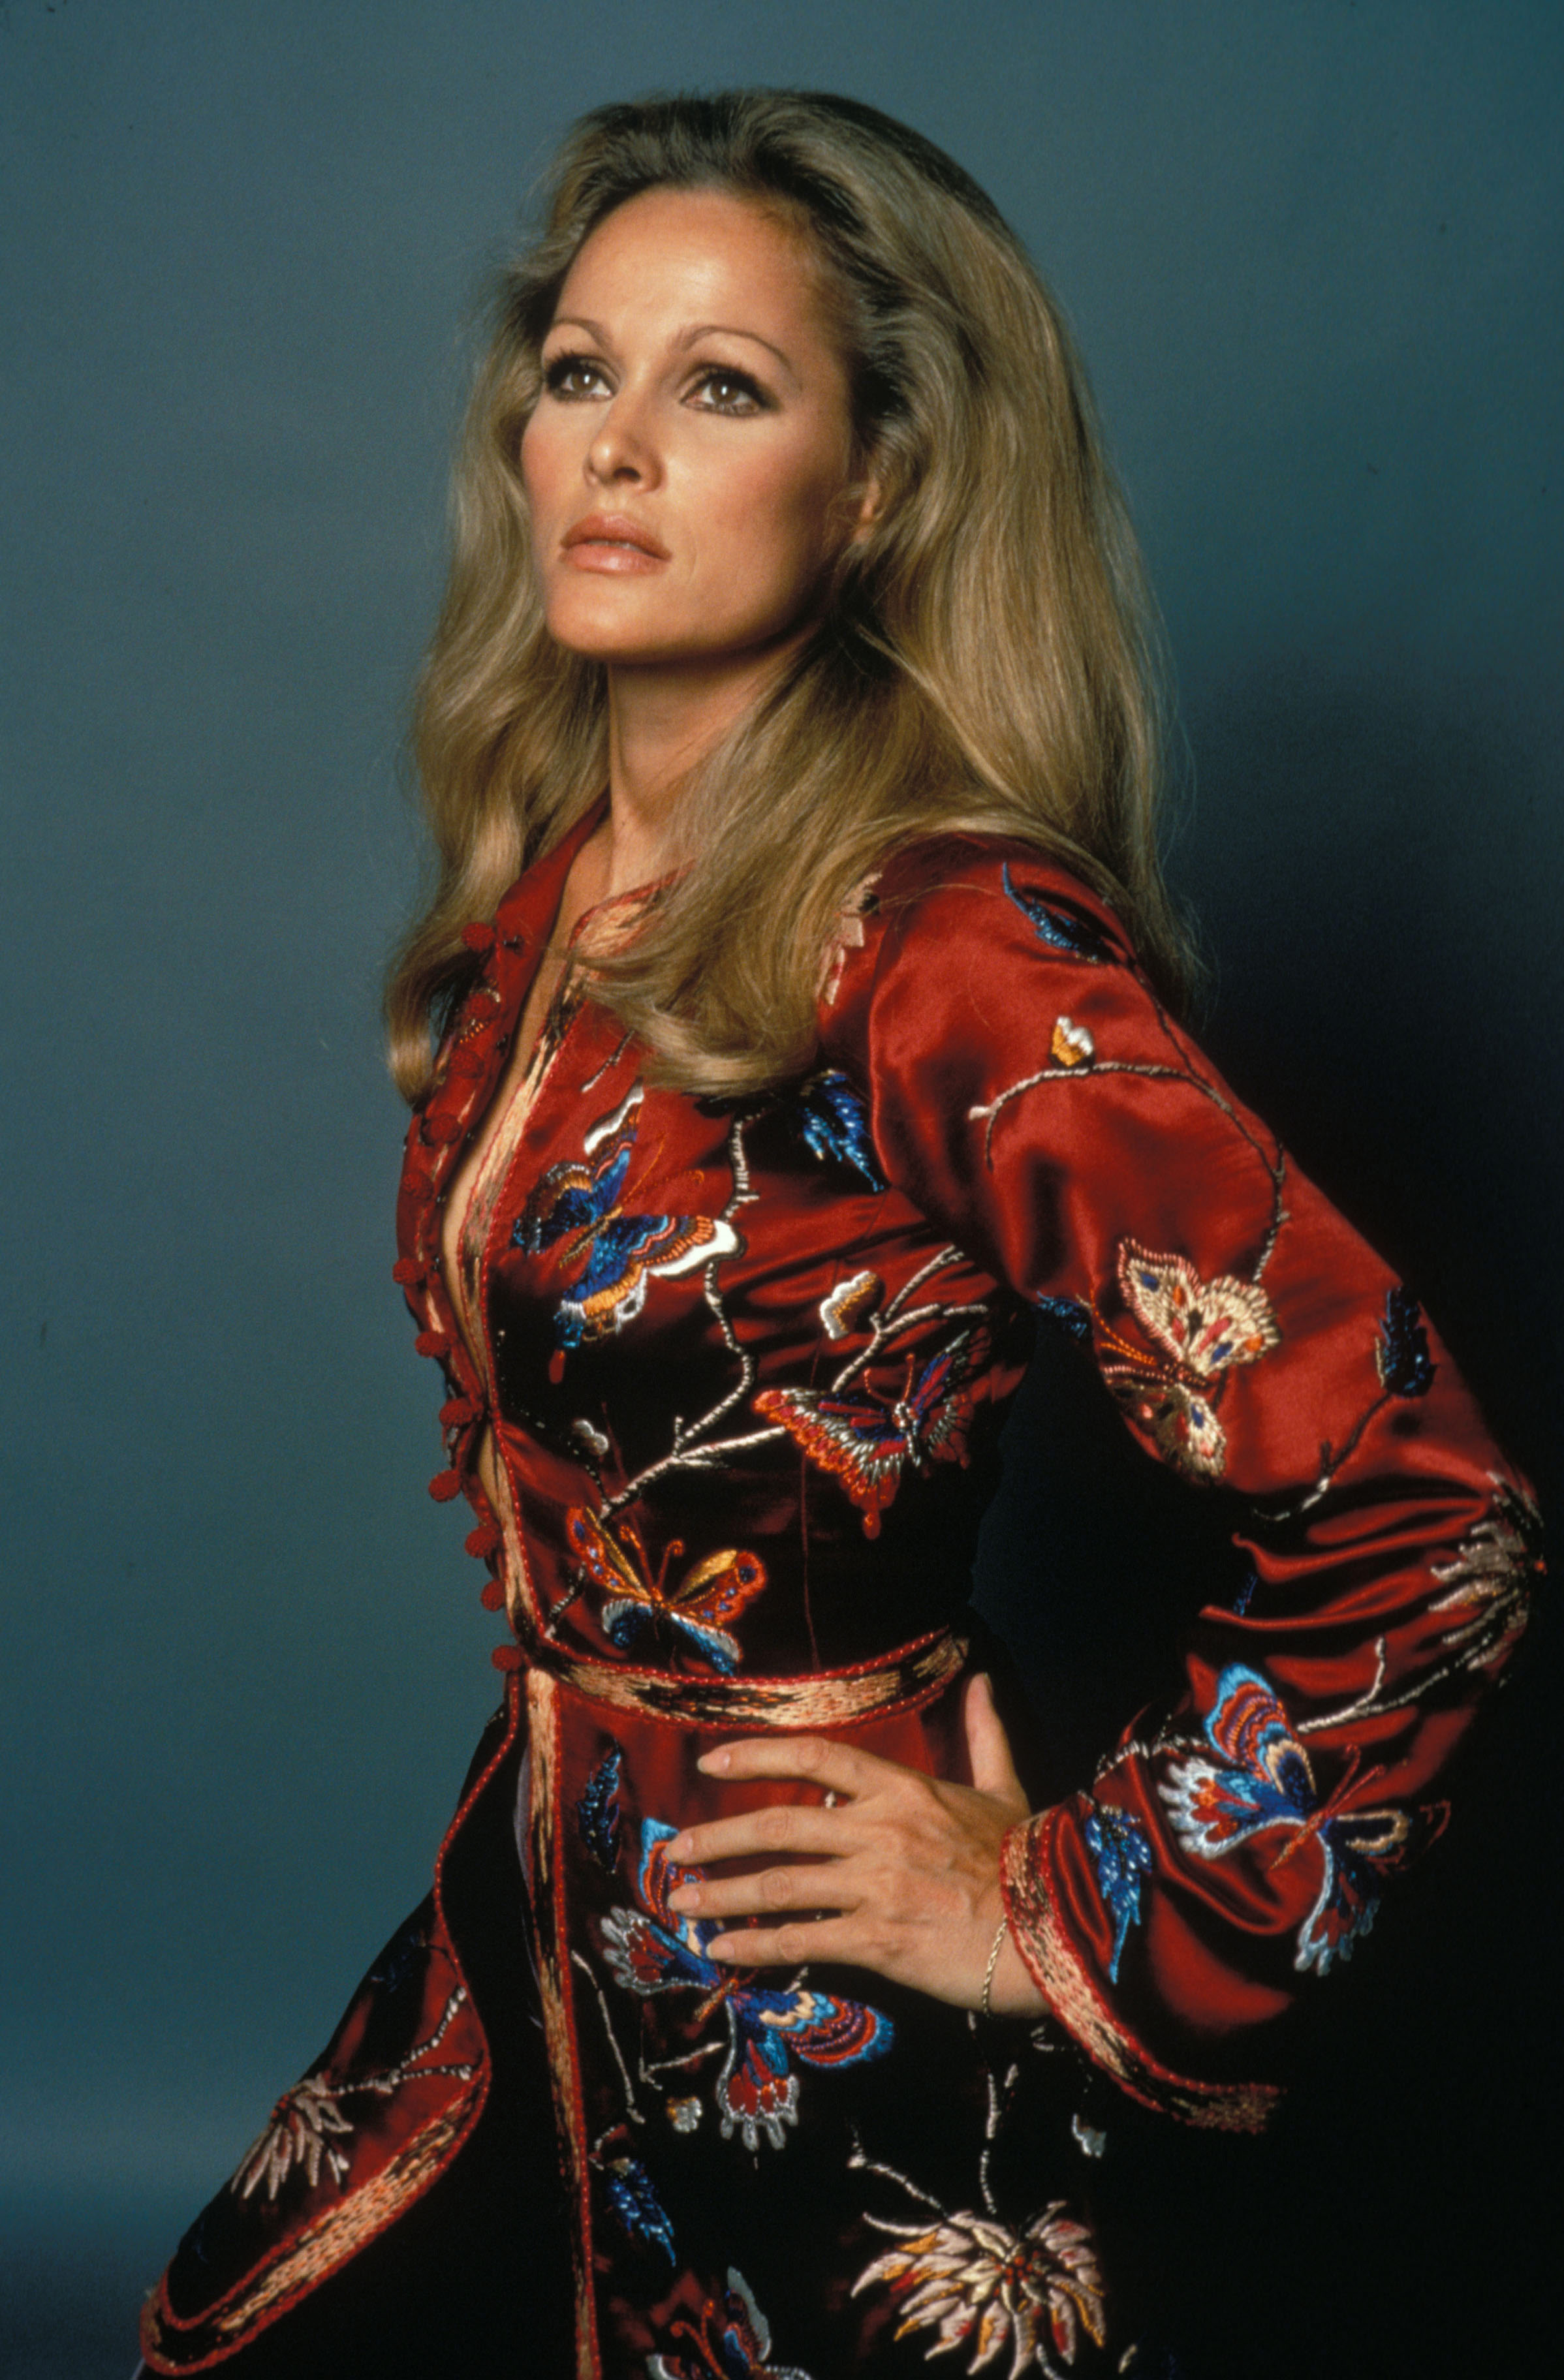 Bond Girl Casino Royale Dress Does Ursula Andress sp...